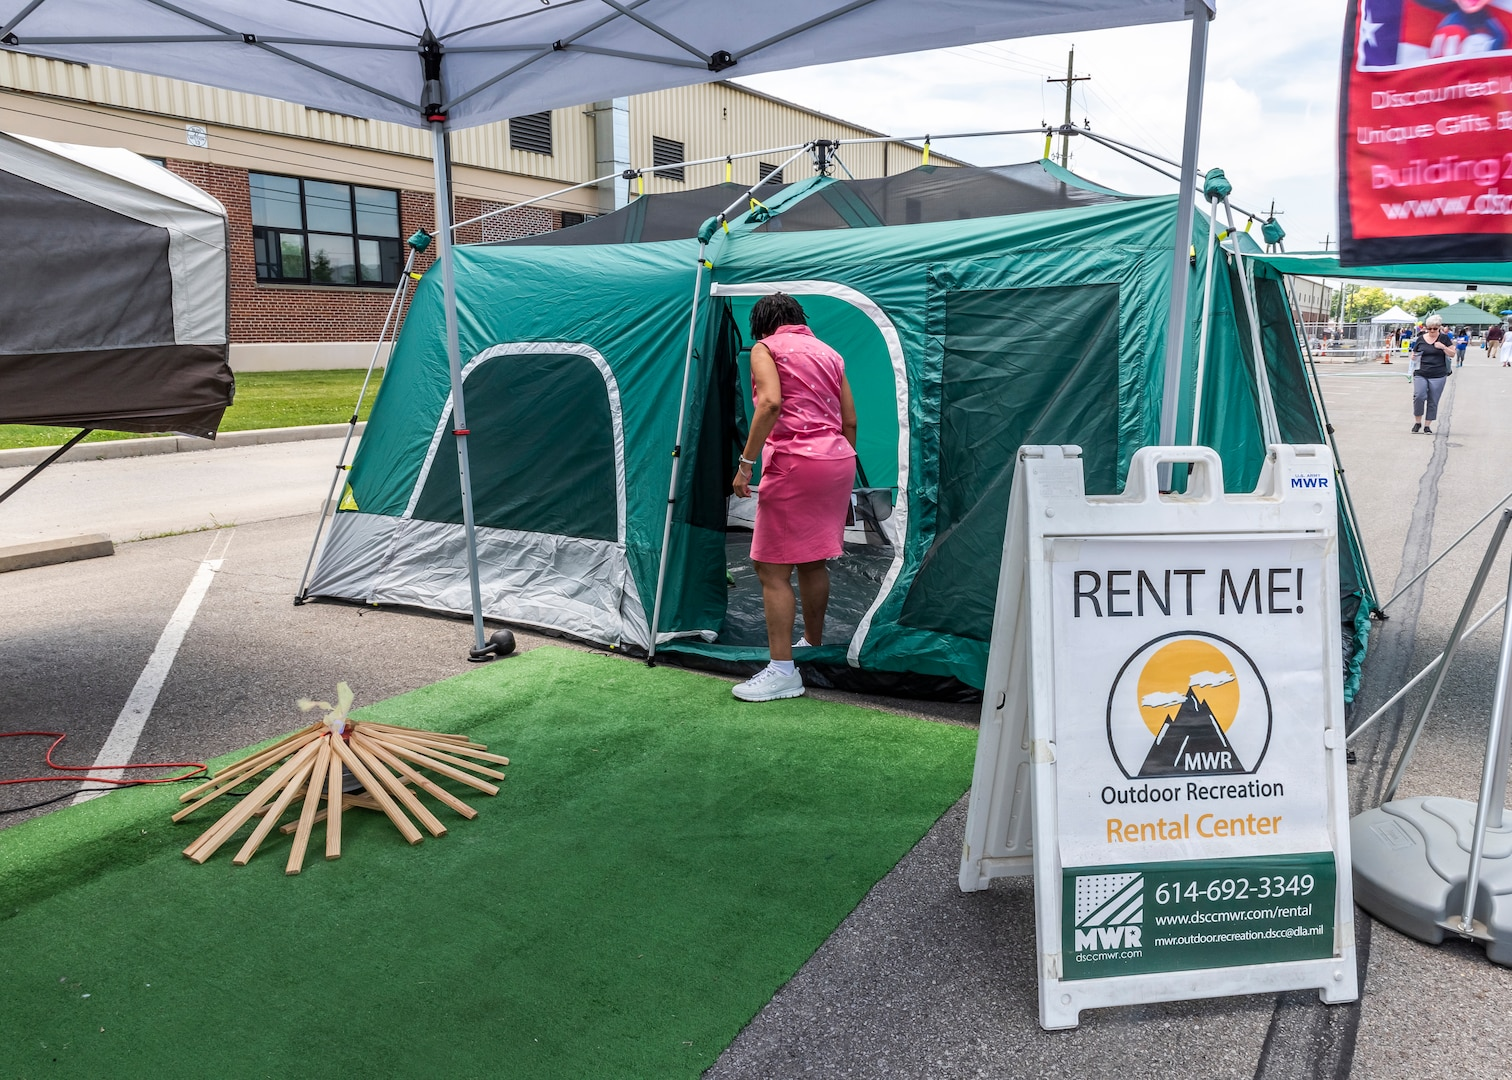 Associate looks at rental tent